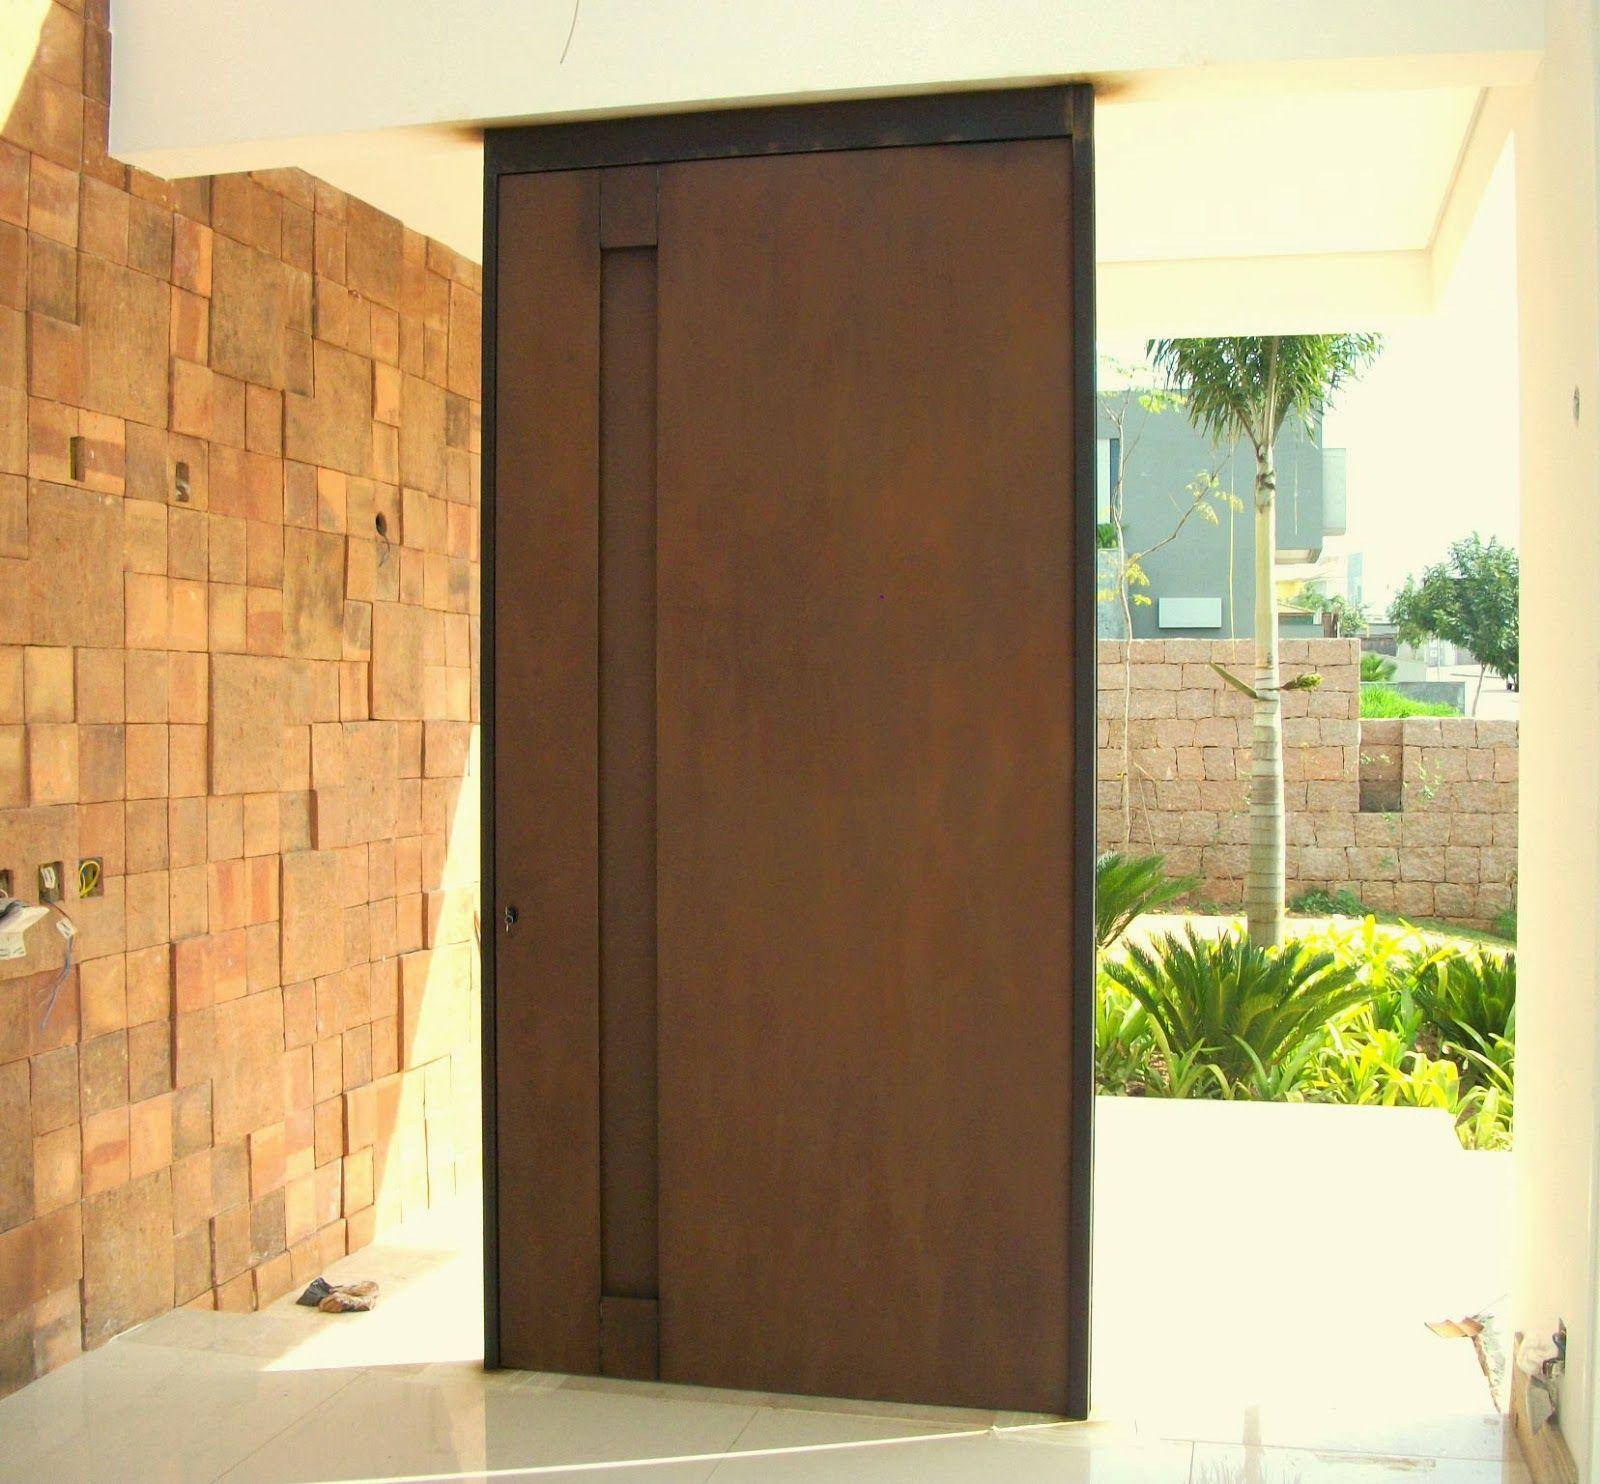 Excepcional porta aço corten pivotante | Portas | Pinterest | Aço corten, Aço  RS12